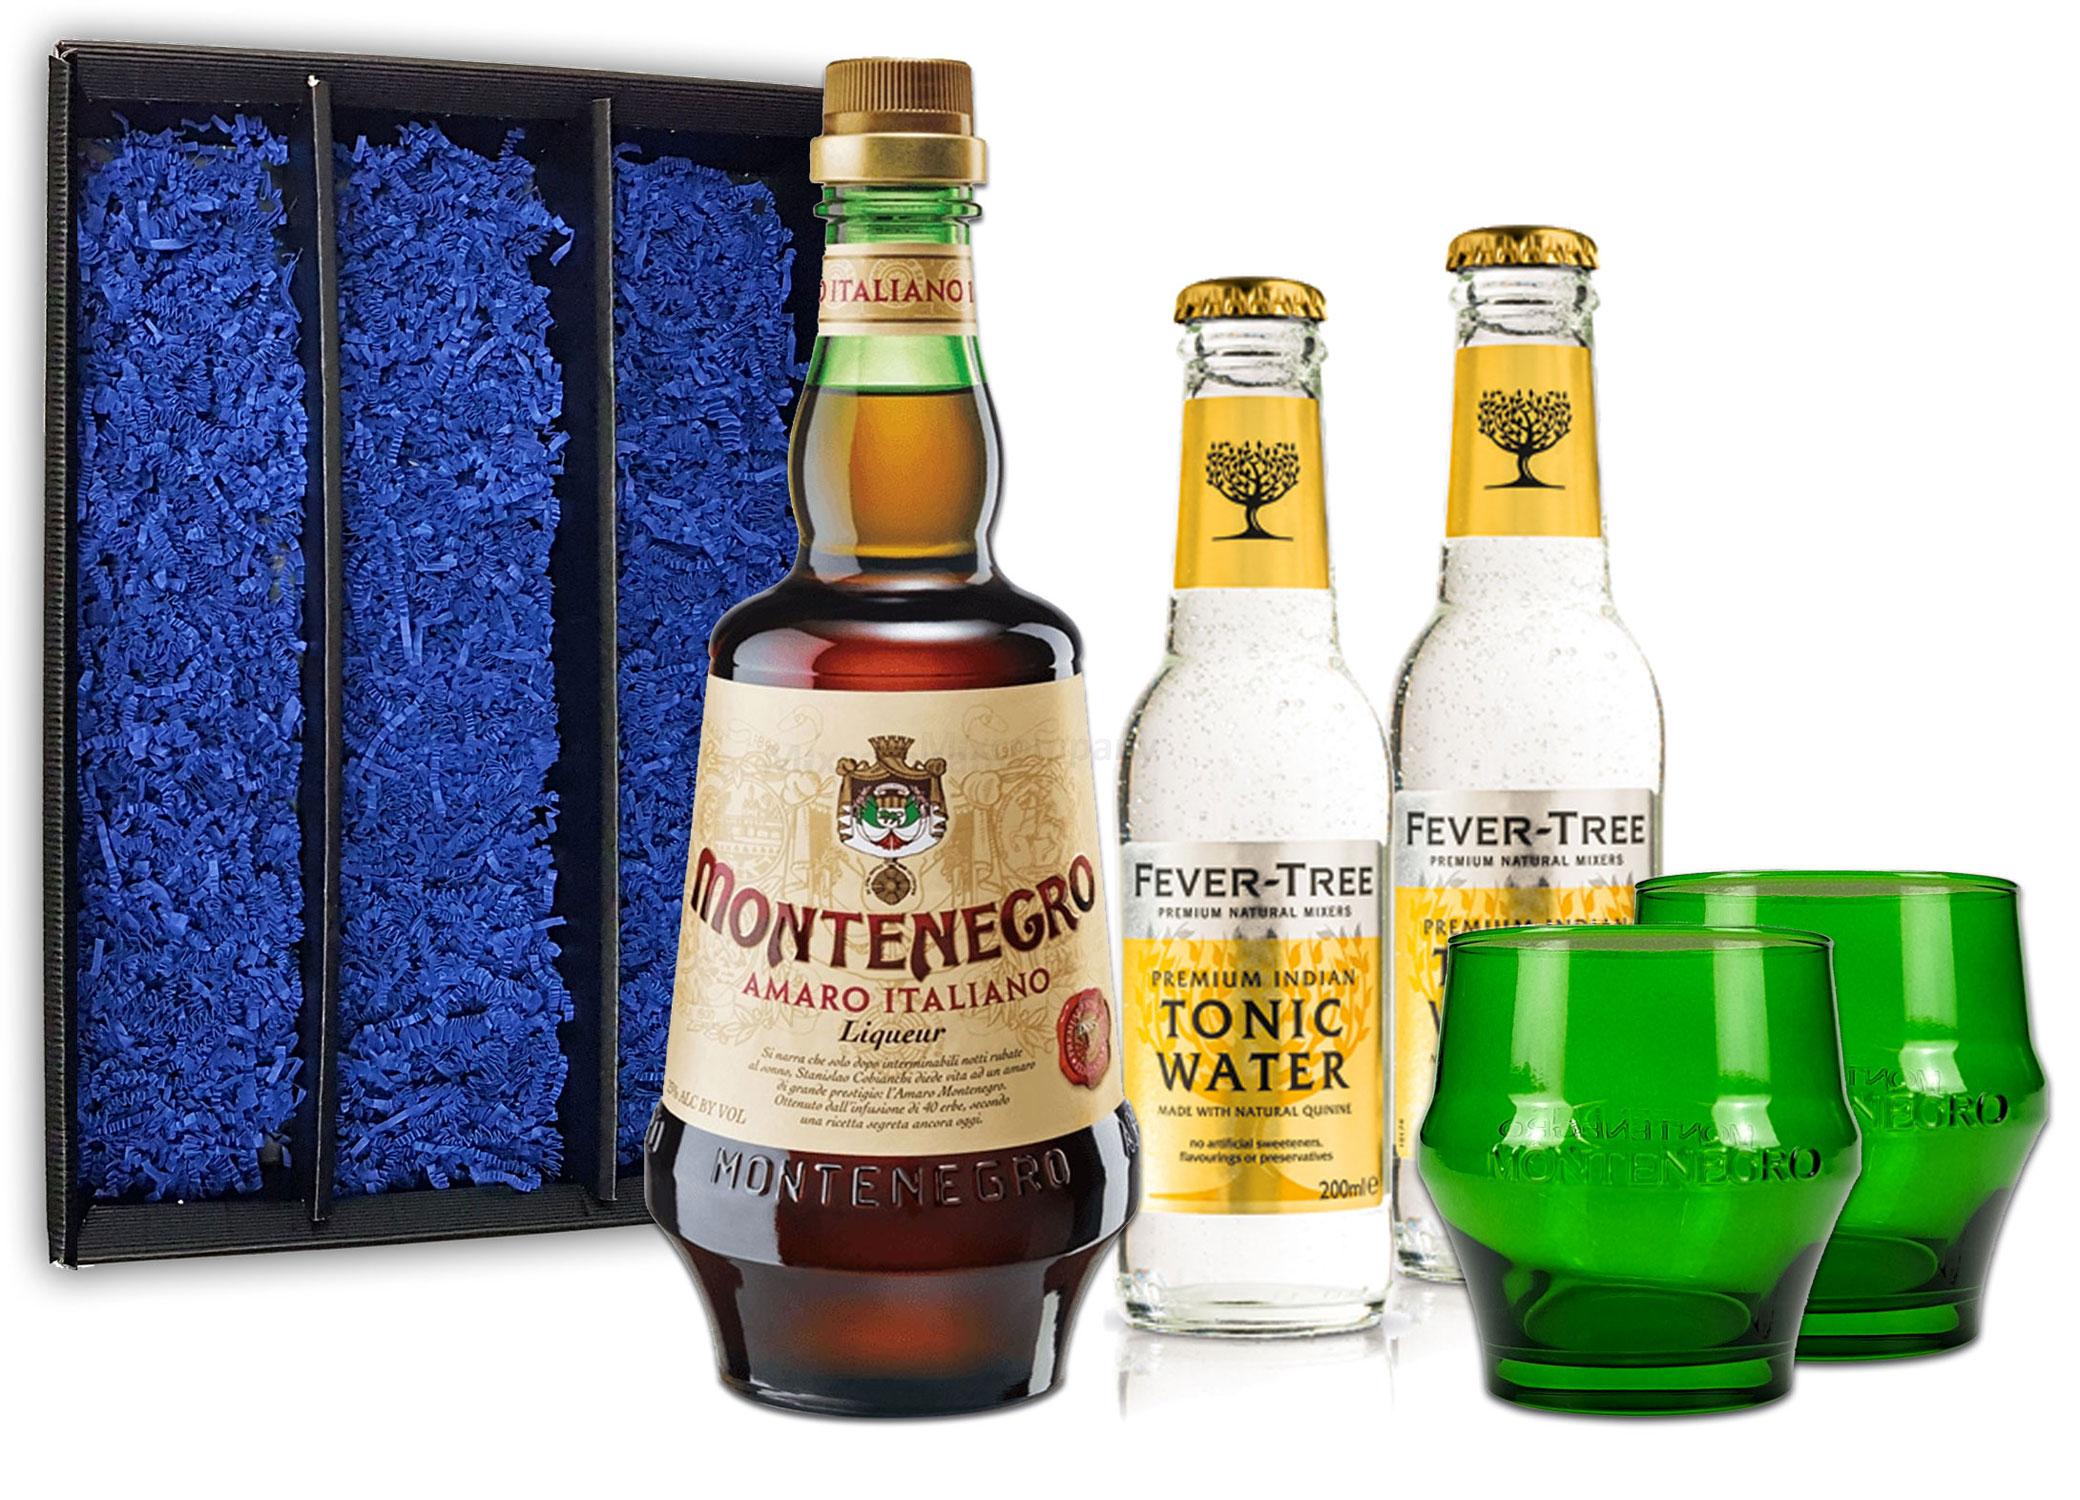 Montenegro & Tonic Geschenkset - Montenegro Amaro Italiano Likör 0,7L (23% Vol) + 2x Fever-Tree Tonic Water 200ml inkl. Pfand MEHRWEG + 2x Gläser Shot Glas grün